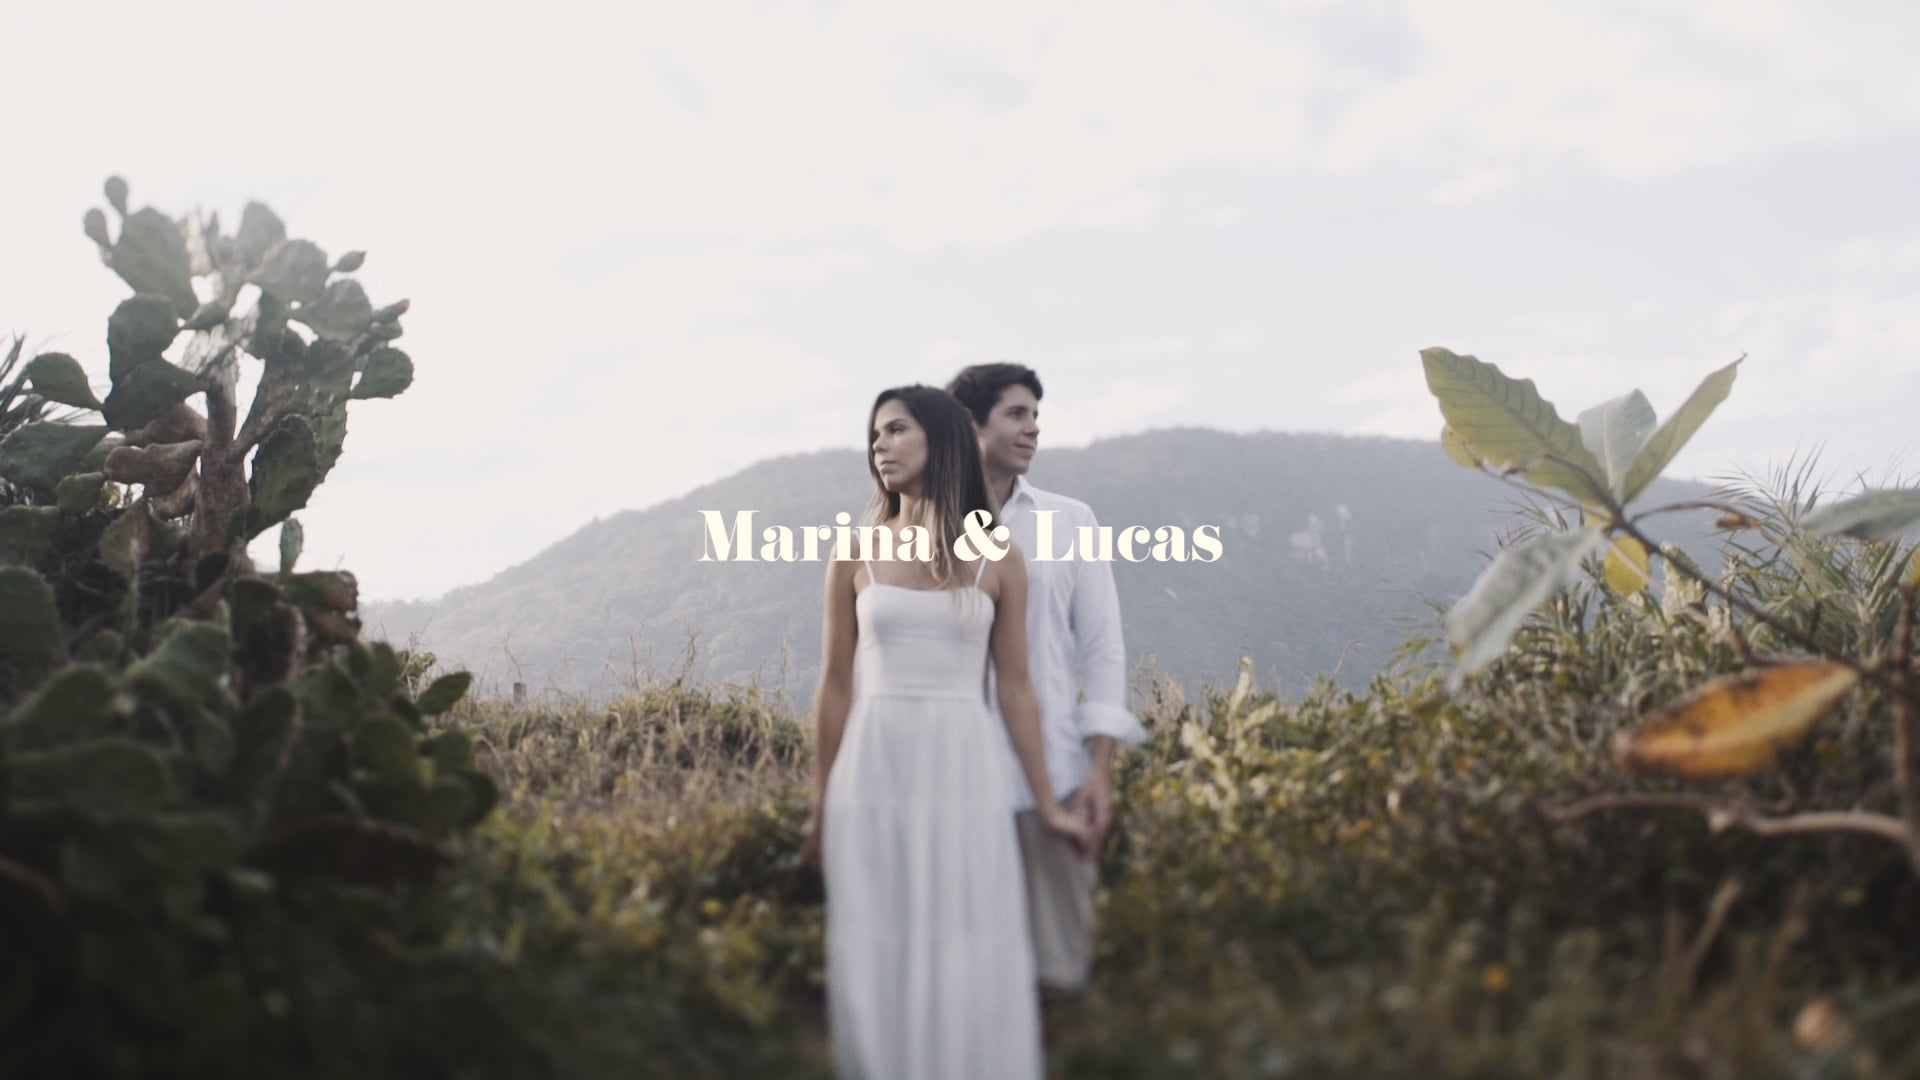 Marina e Lucas [ save the date ]